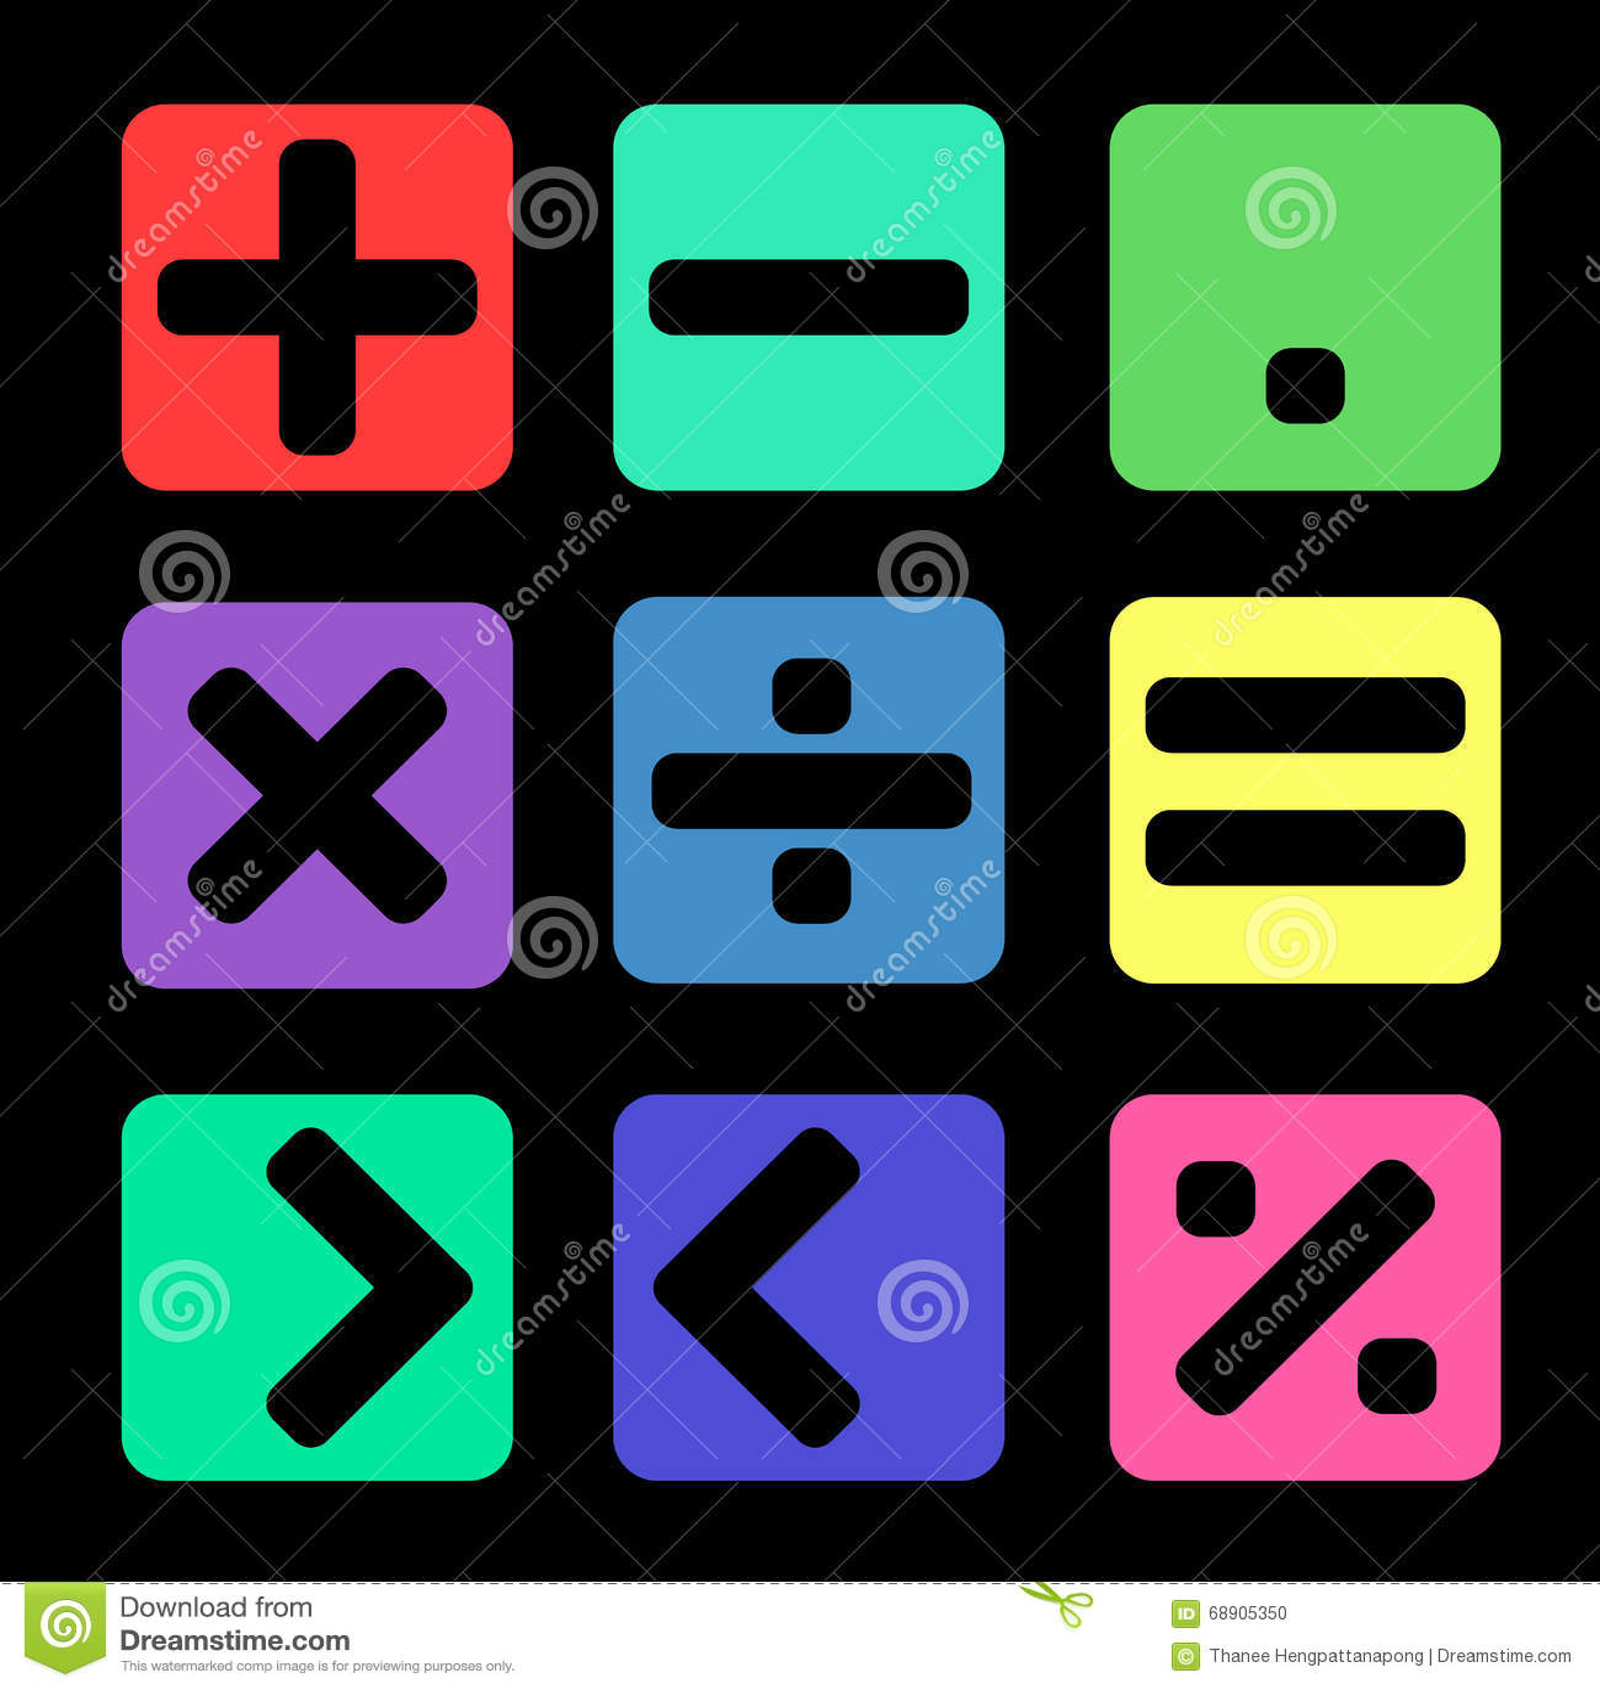 Math symbol on black background stock photo image of square math symbol on black background biocorpaavc